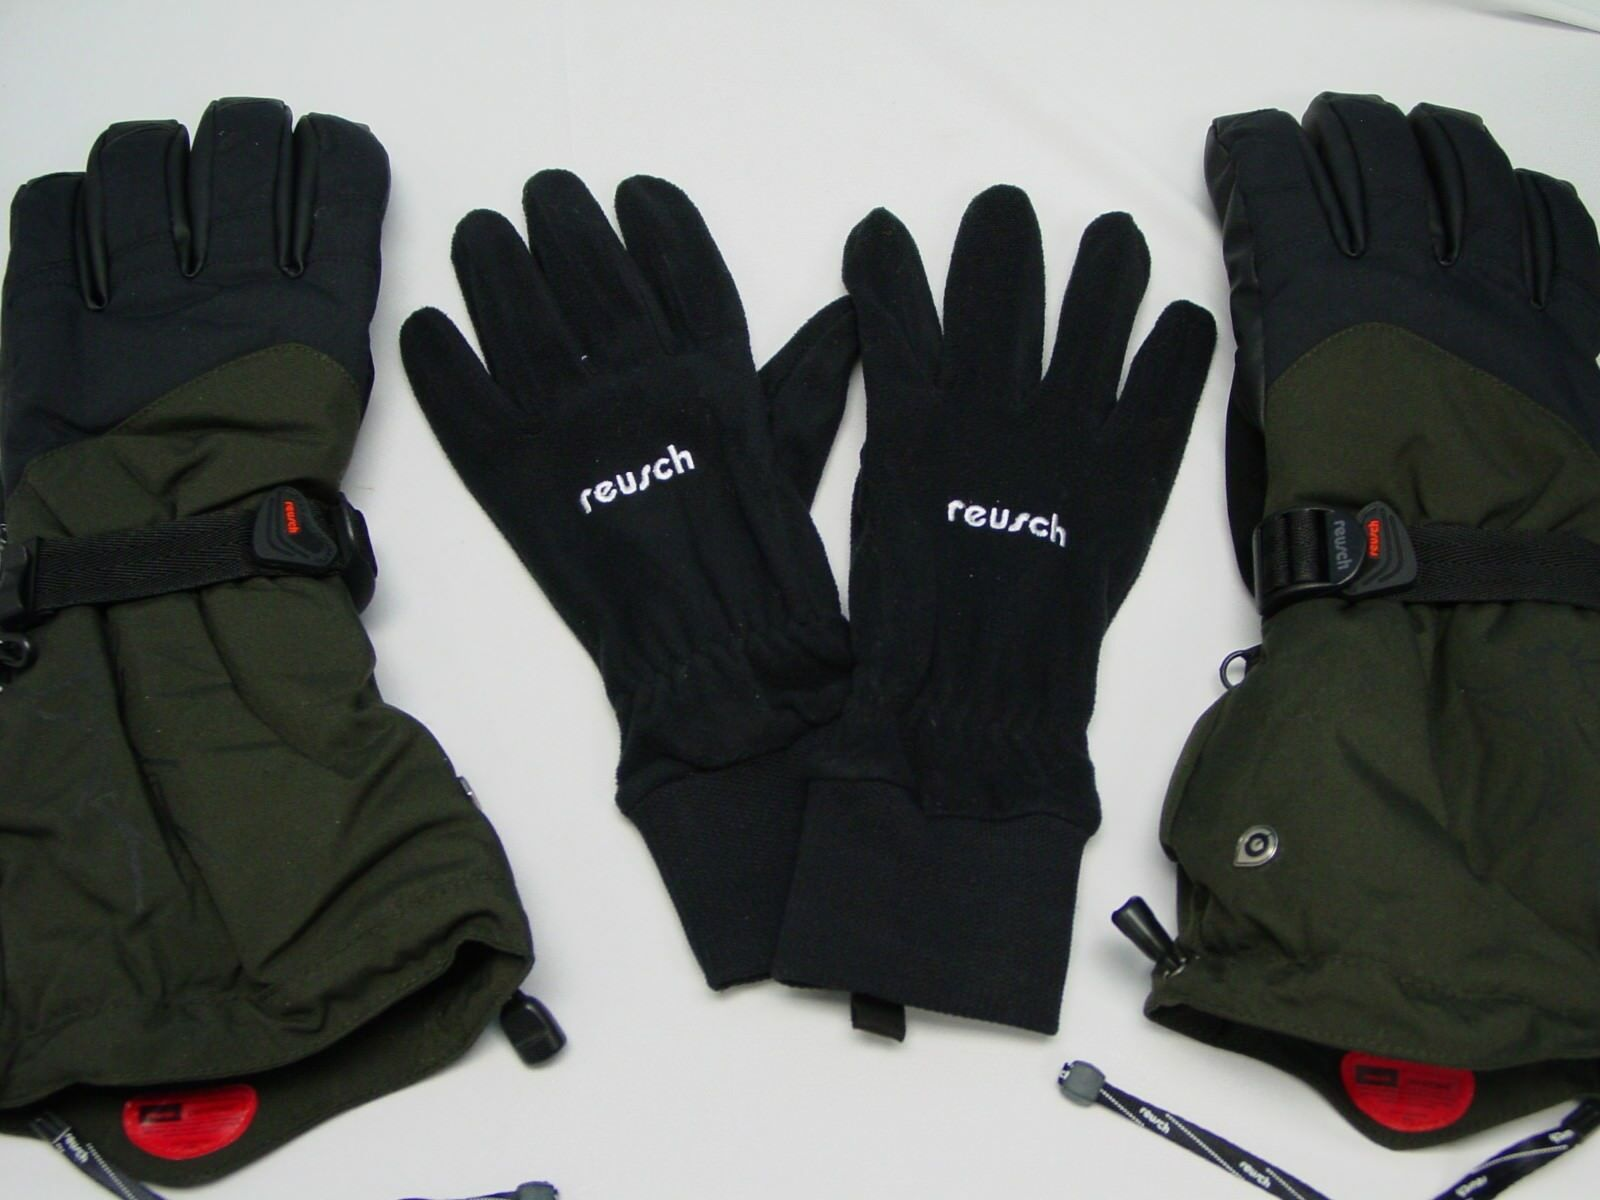 Wasserfest 3 Handschuhe in 1 Reusch Snowboard Ski Medium 8.5 Kombo 2890206